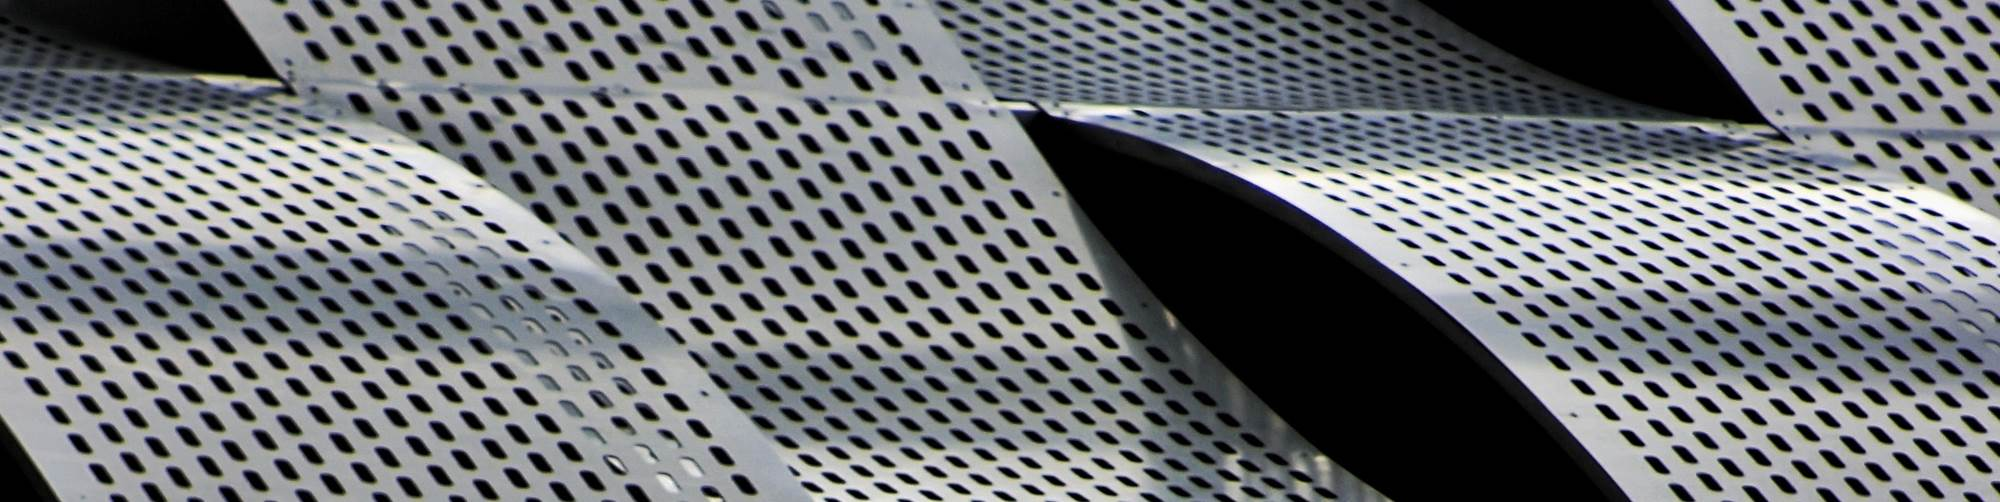 Anodization of aluminum